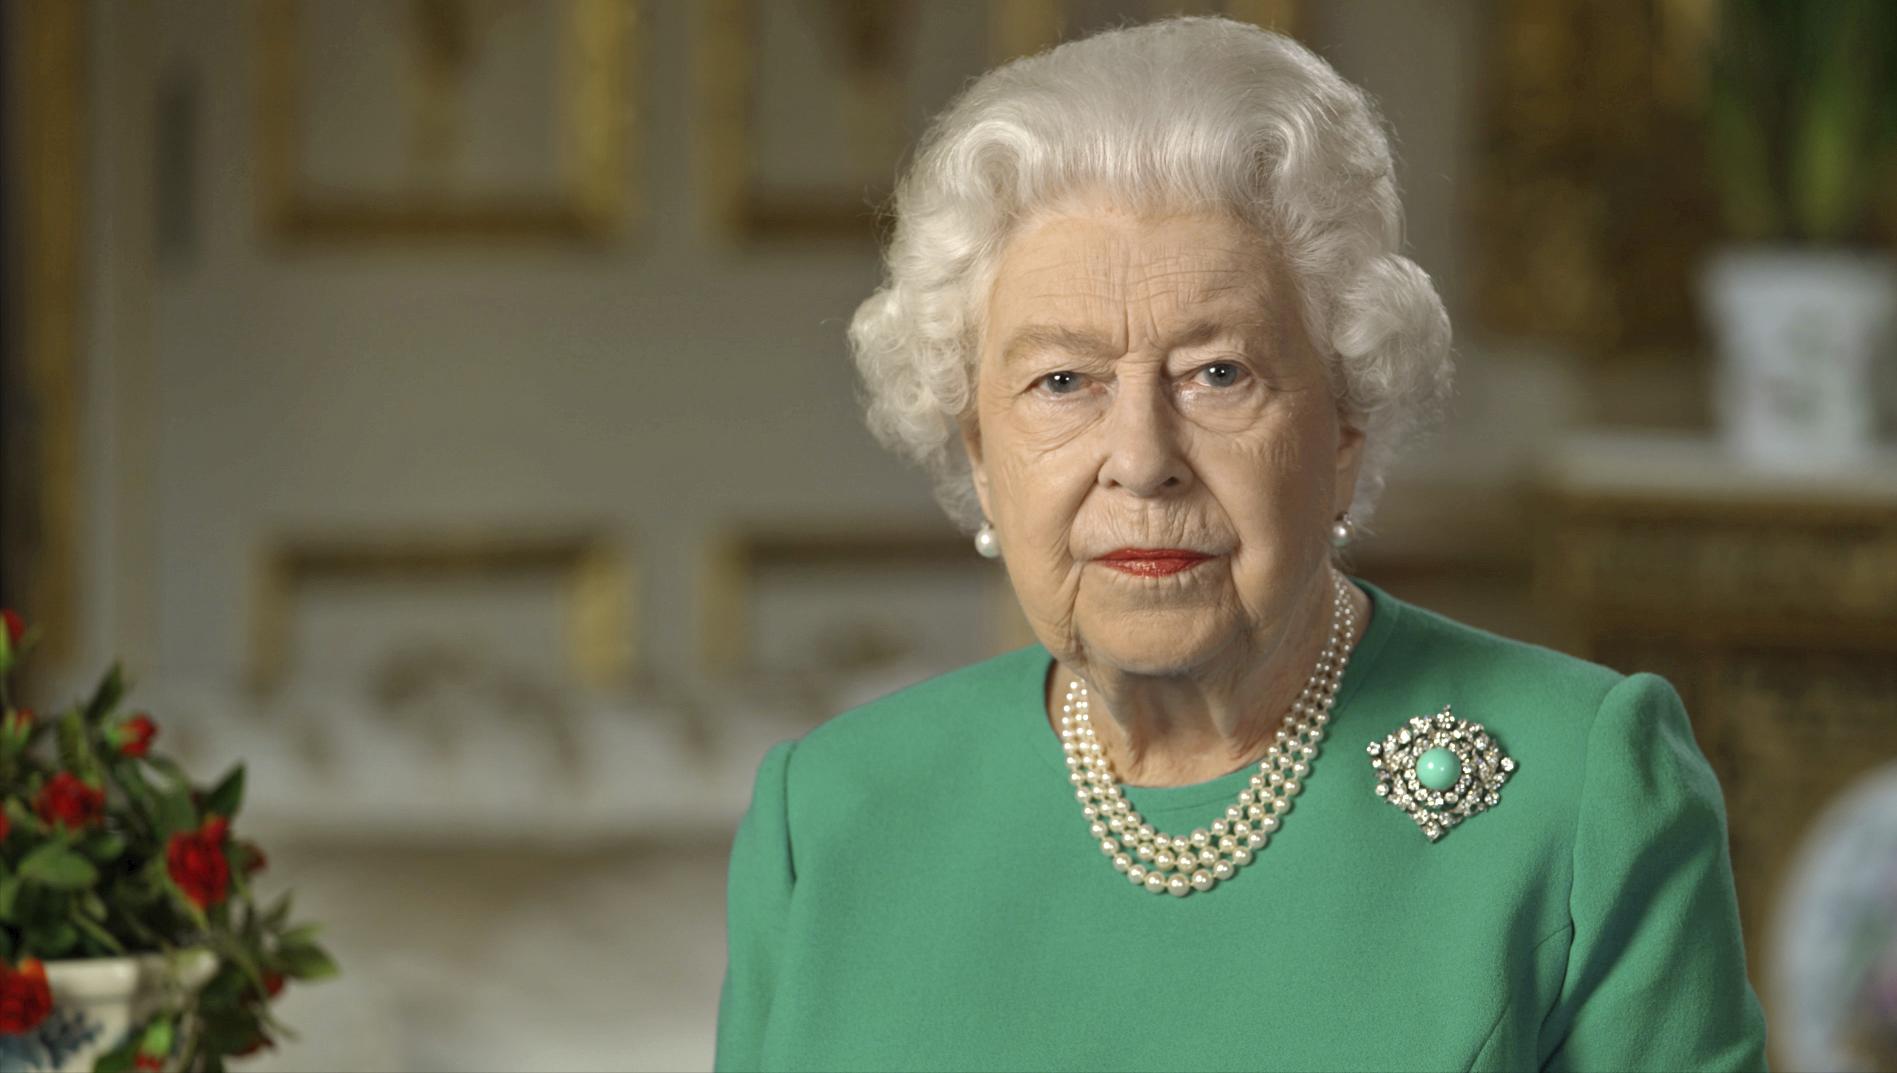 Queen Elizabeth Ii Christmas Message 2020 We will meet again': Queen delivers message of hope to UK amid